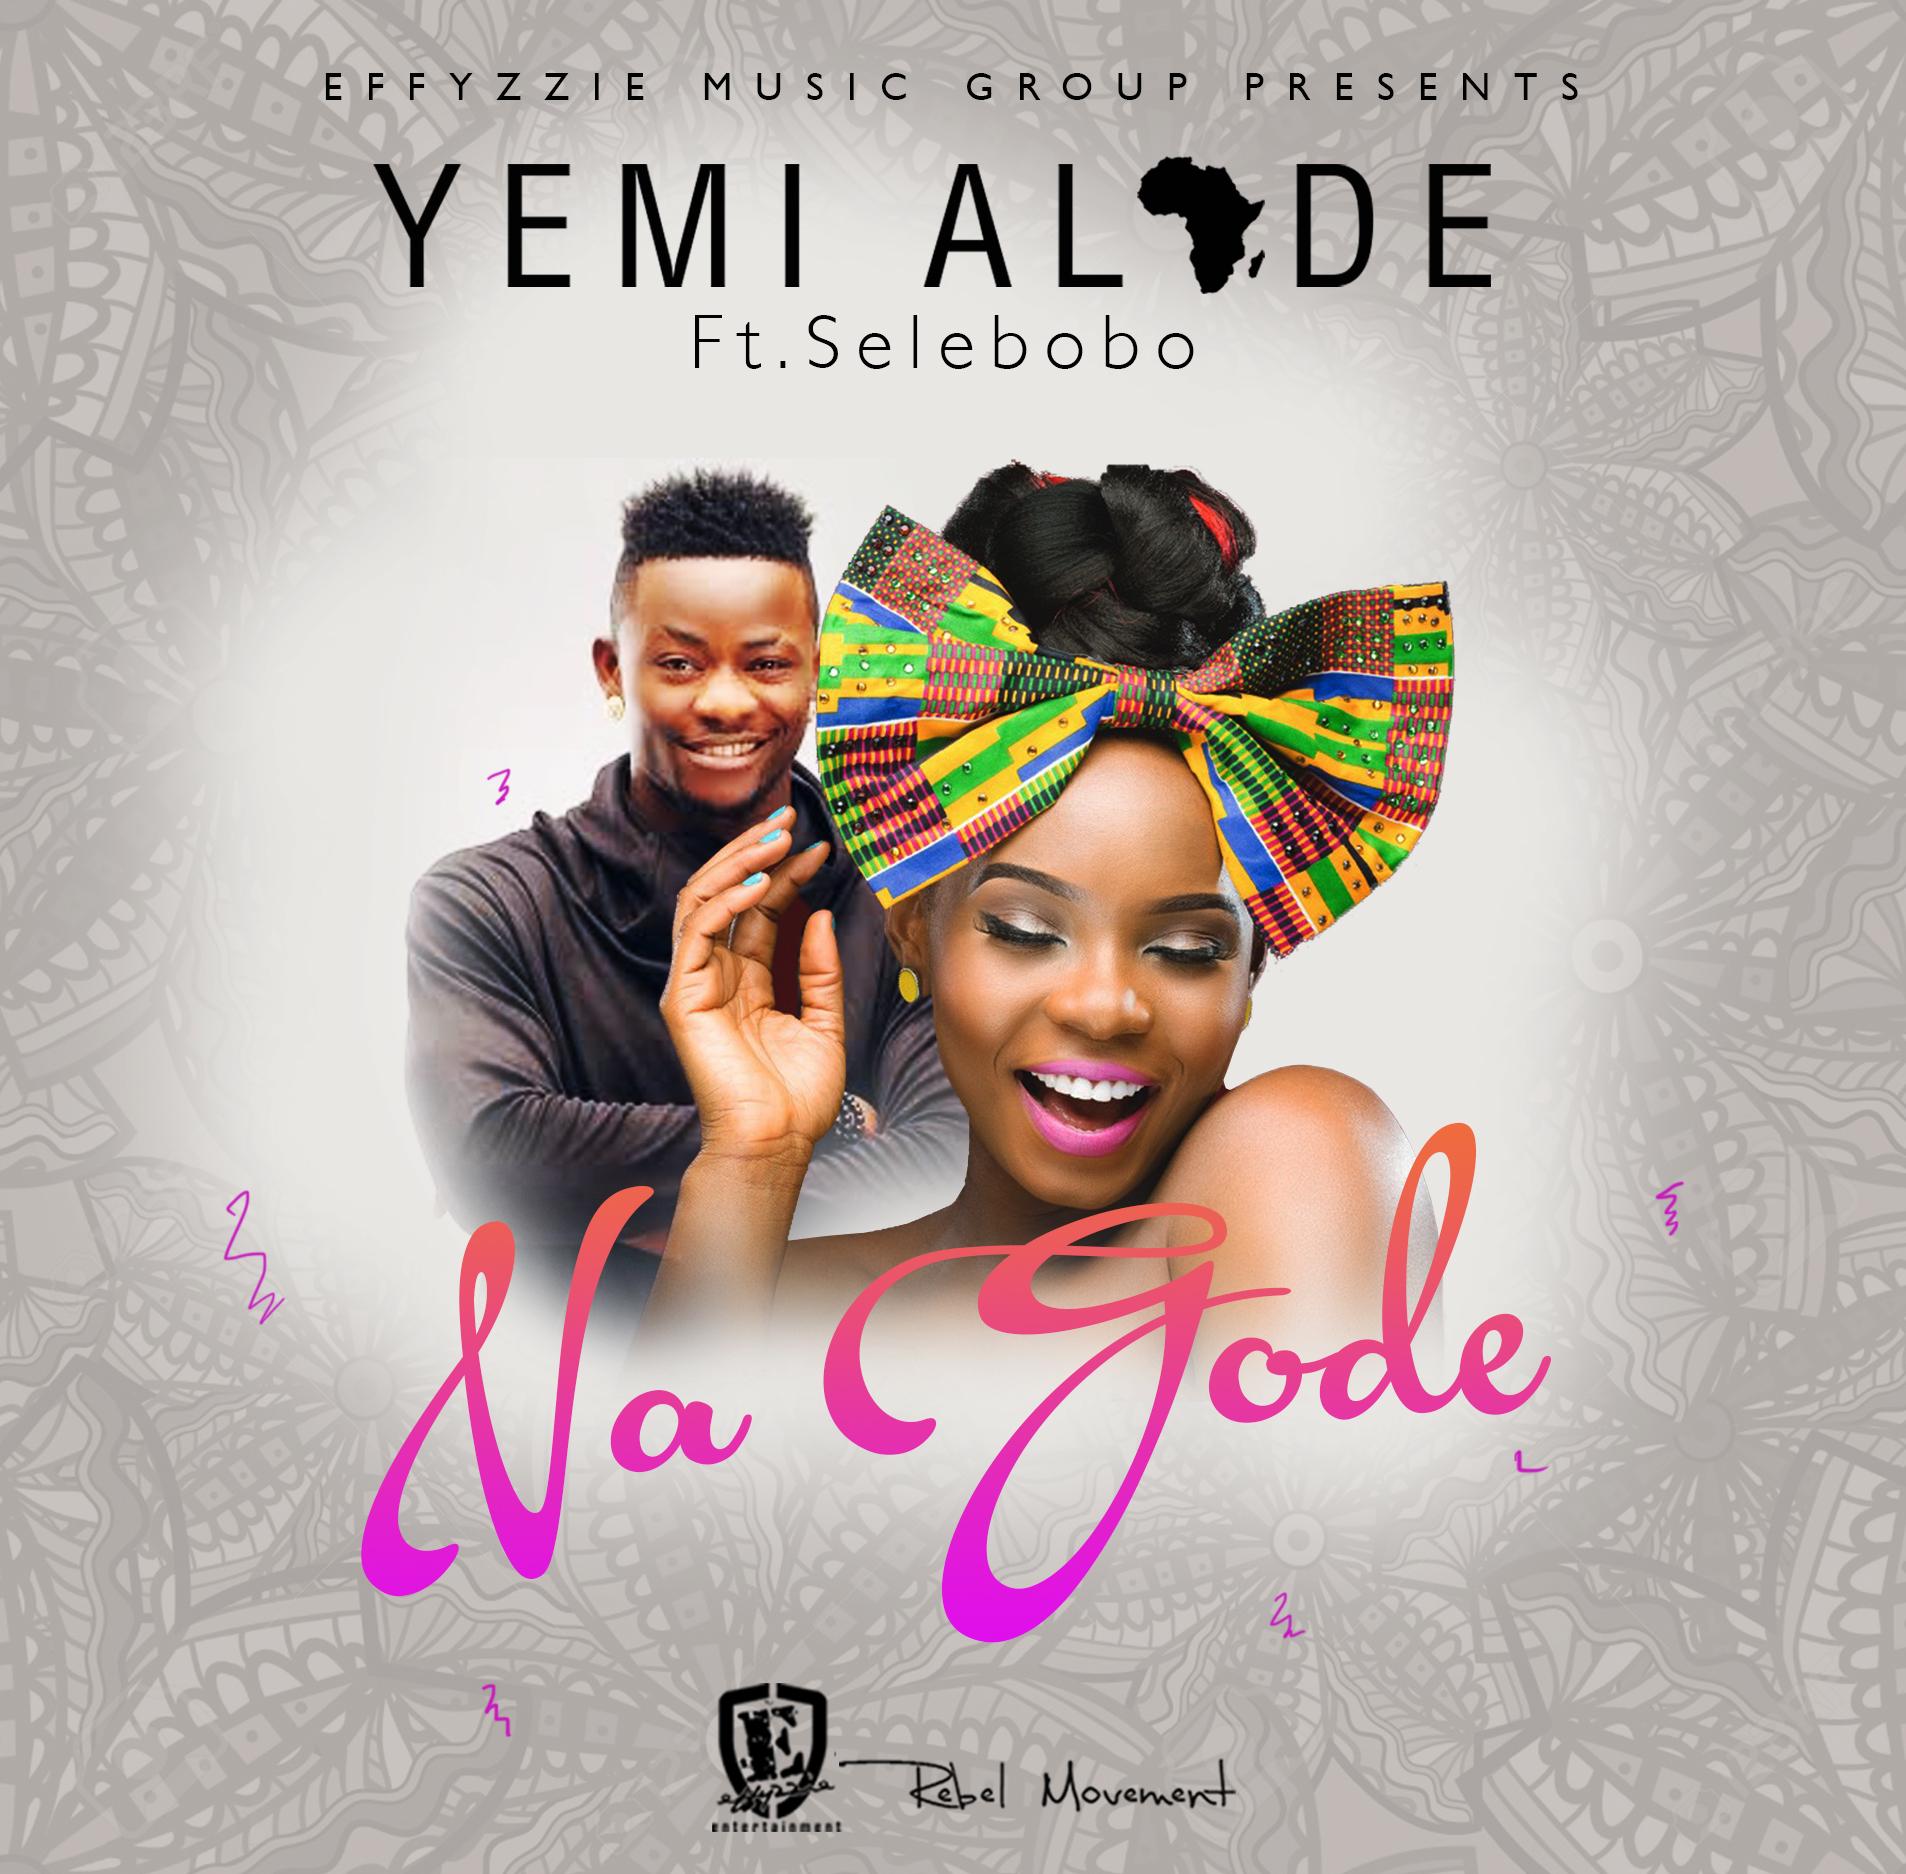 Yemi Alade - Na Gode ft. Selebobo